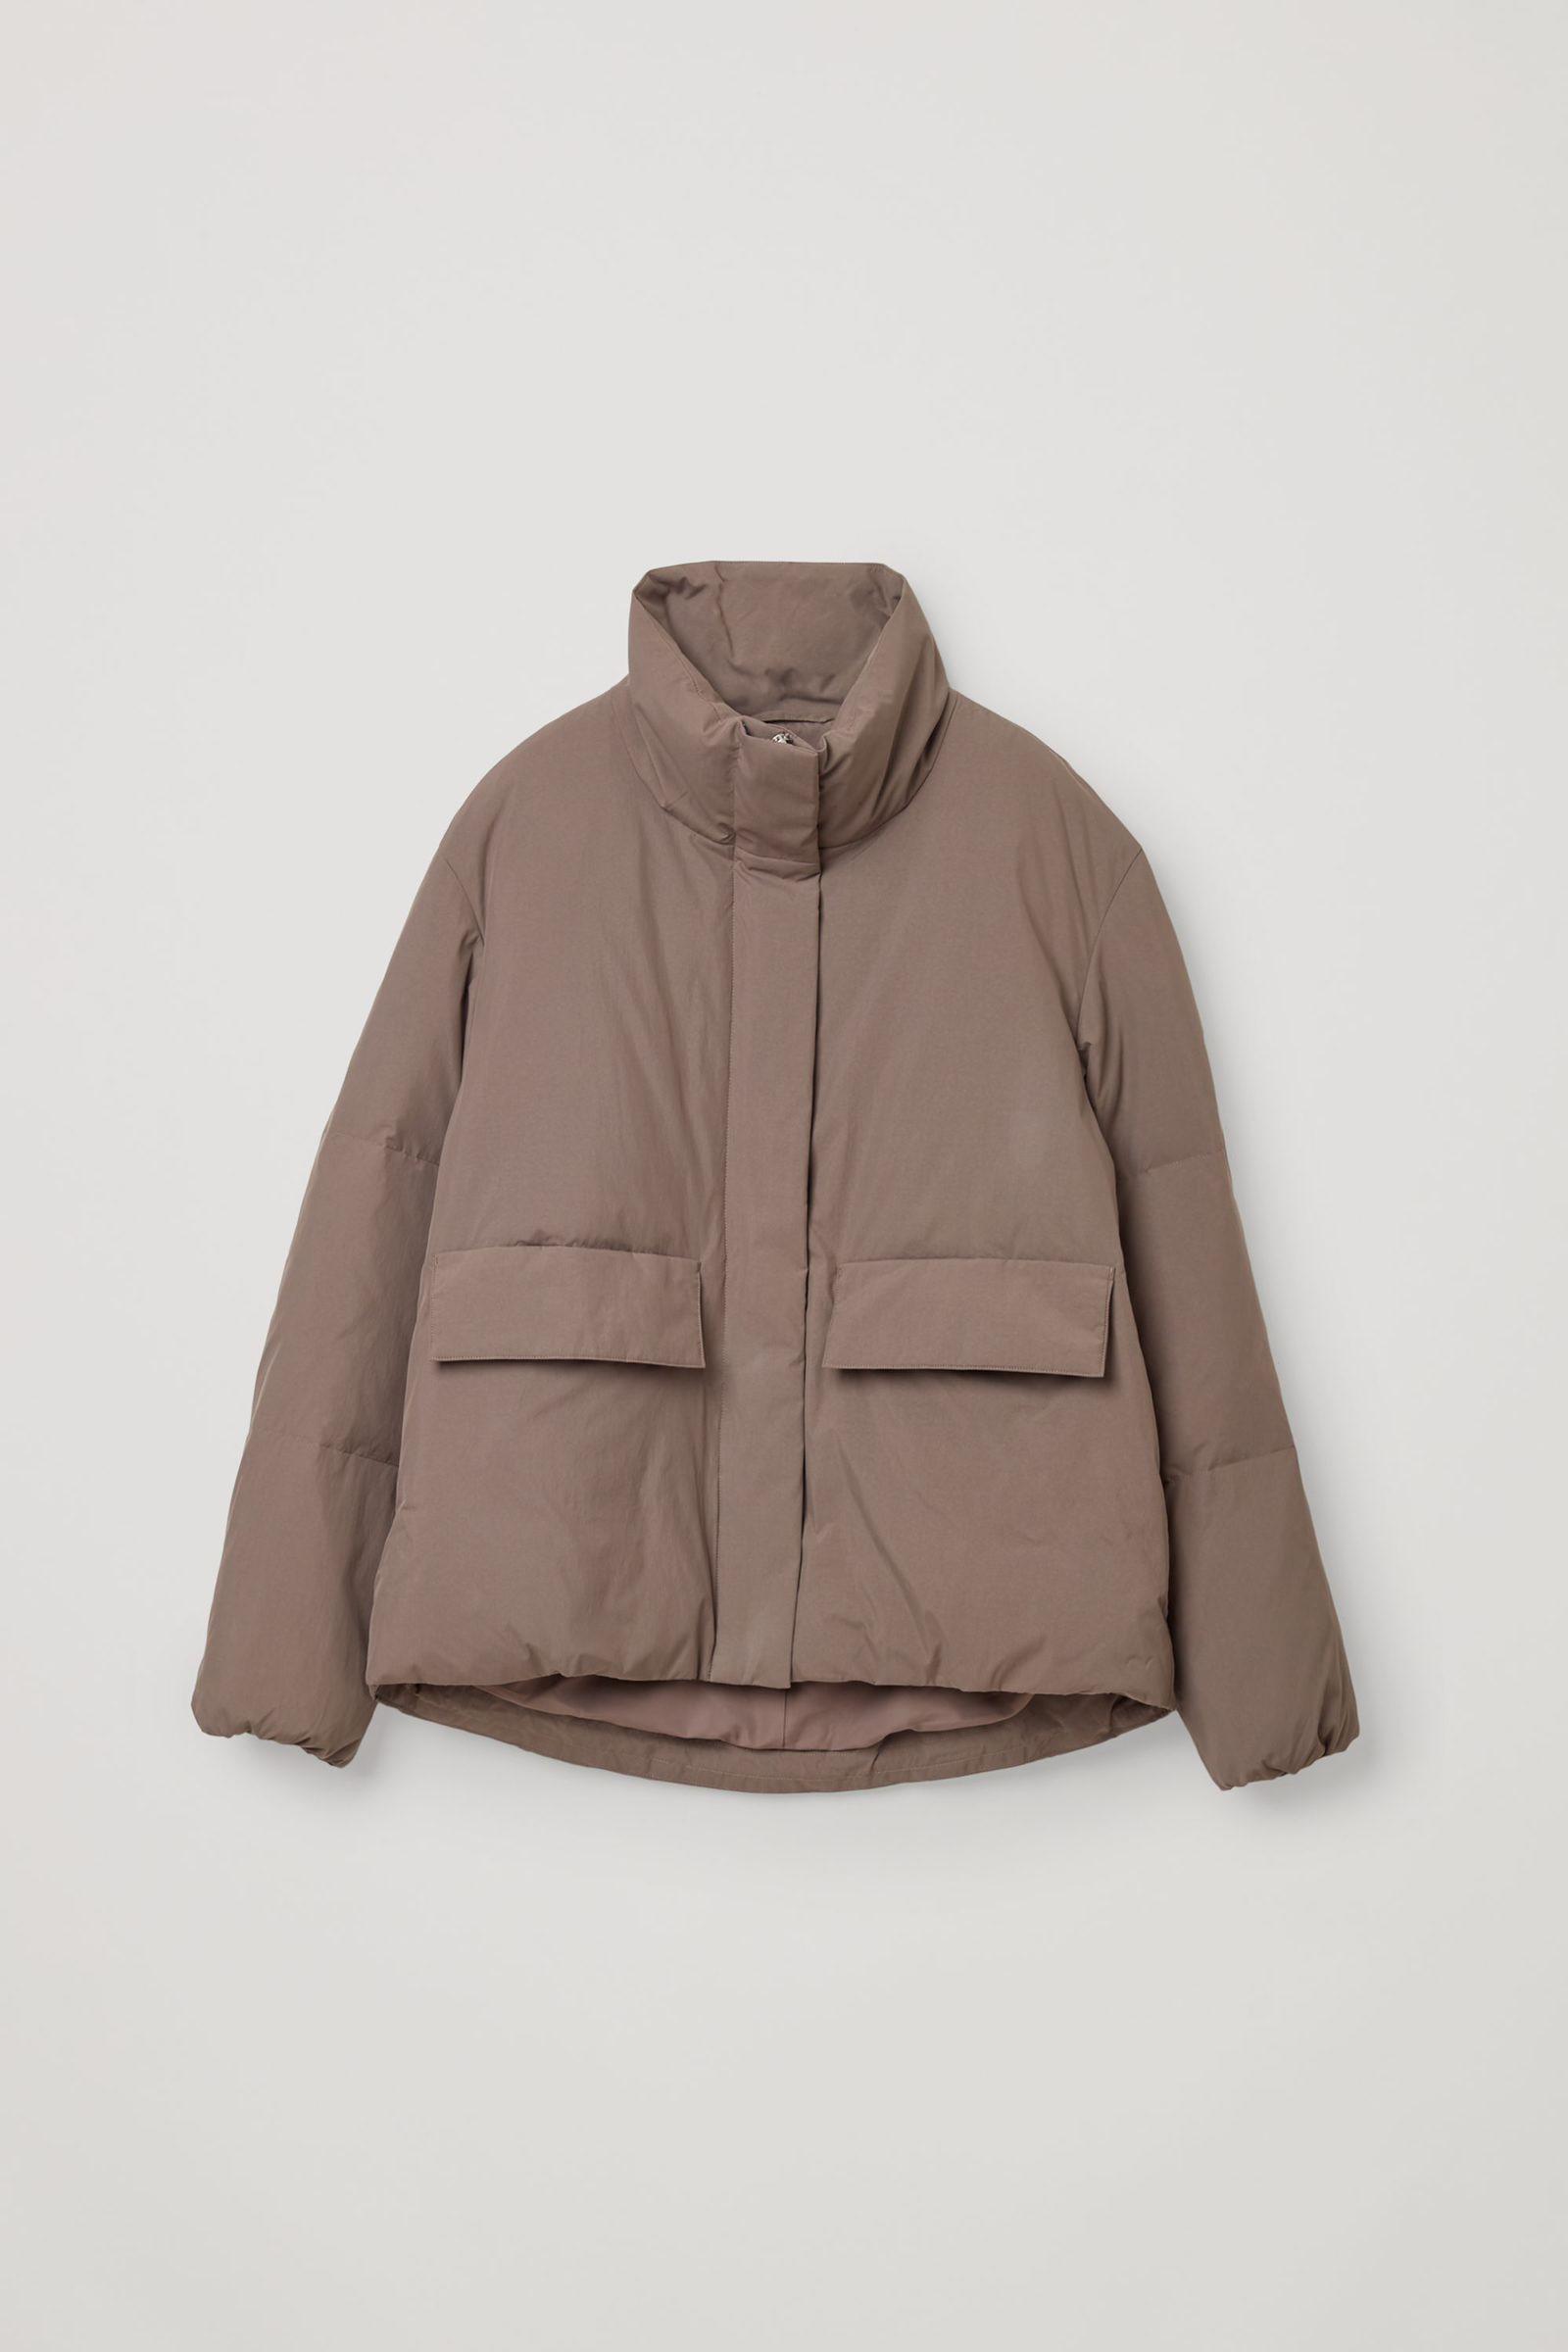 COS 패딩 푸퍼 재킷의 몰 그레이컬러 Product입니다.